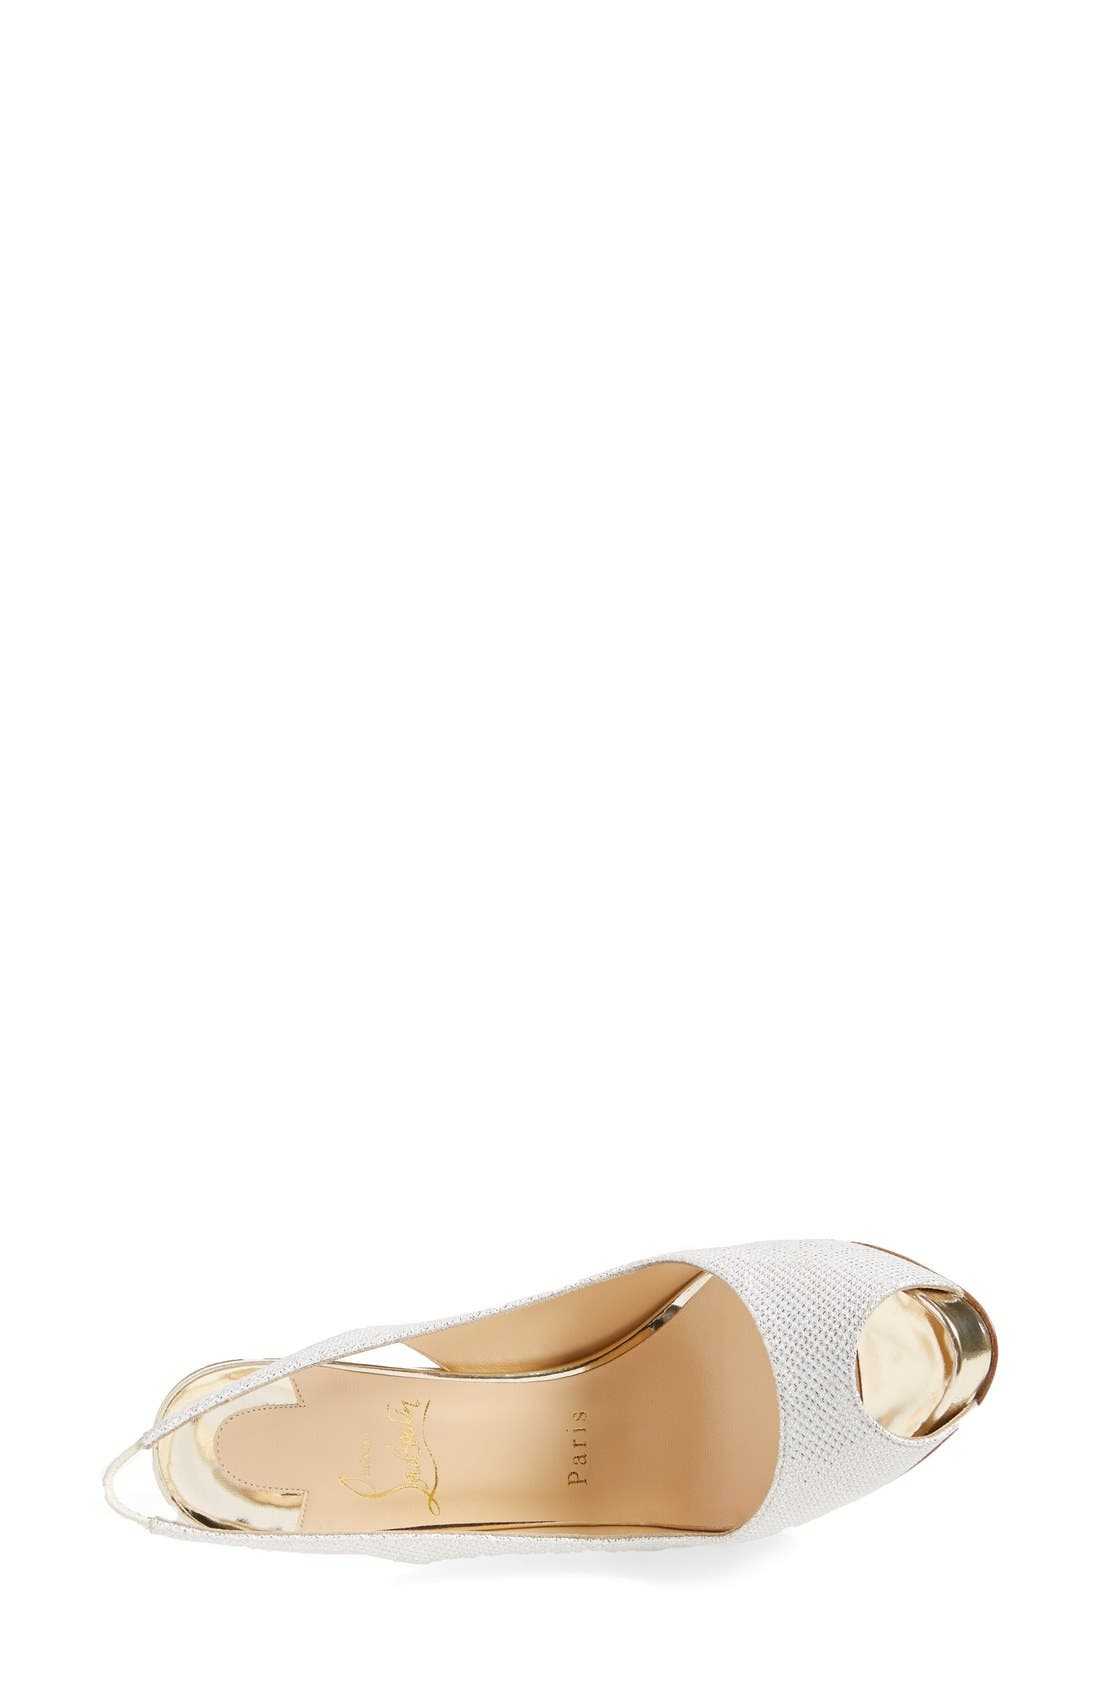 Alternate Image 3  - Christian Louboutin Peep Toe Slingback Pump